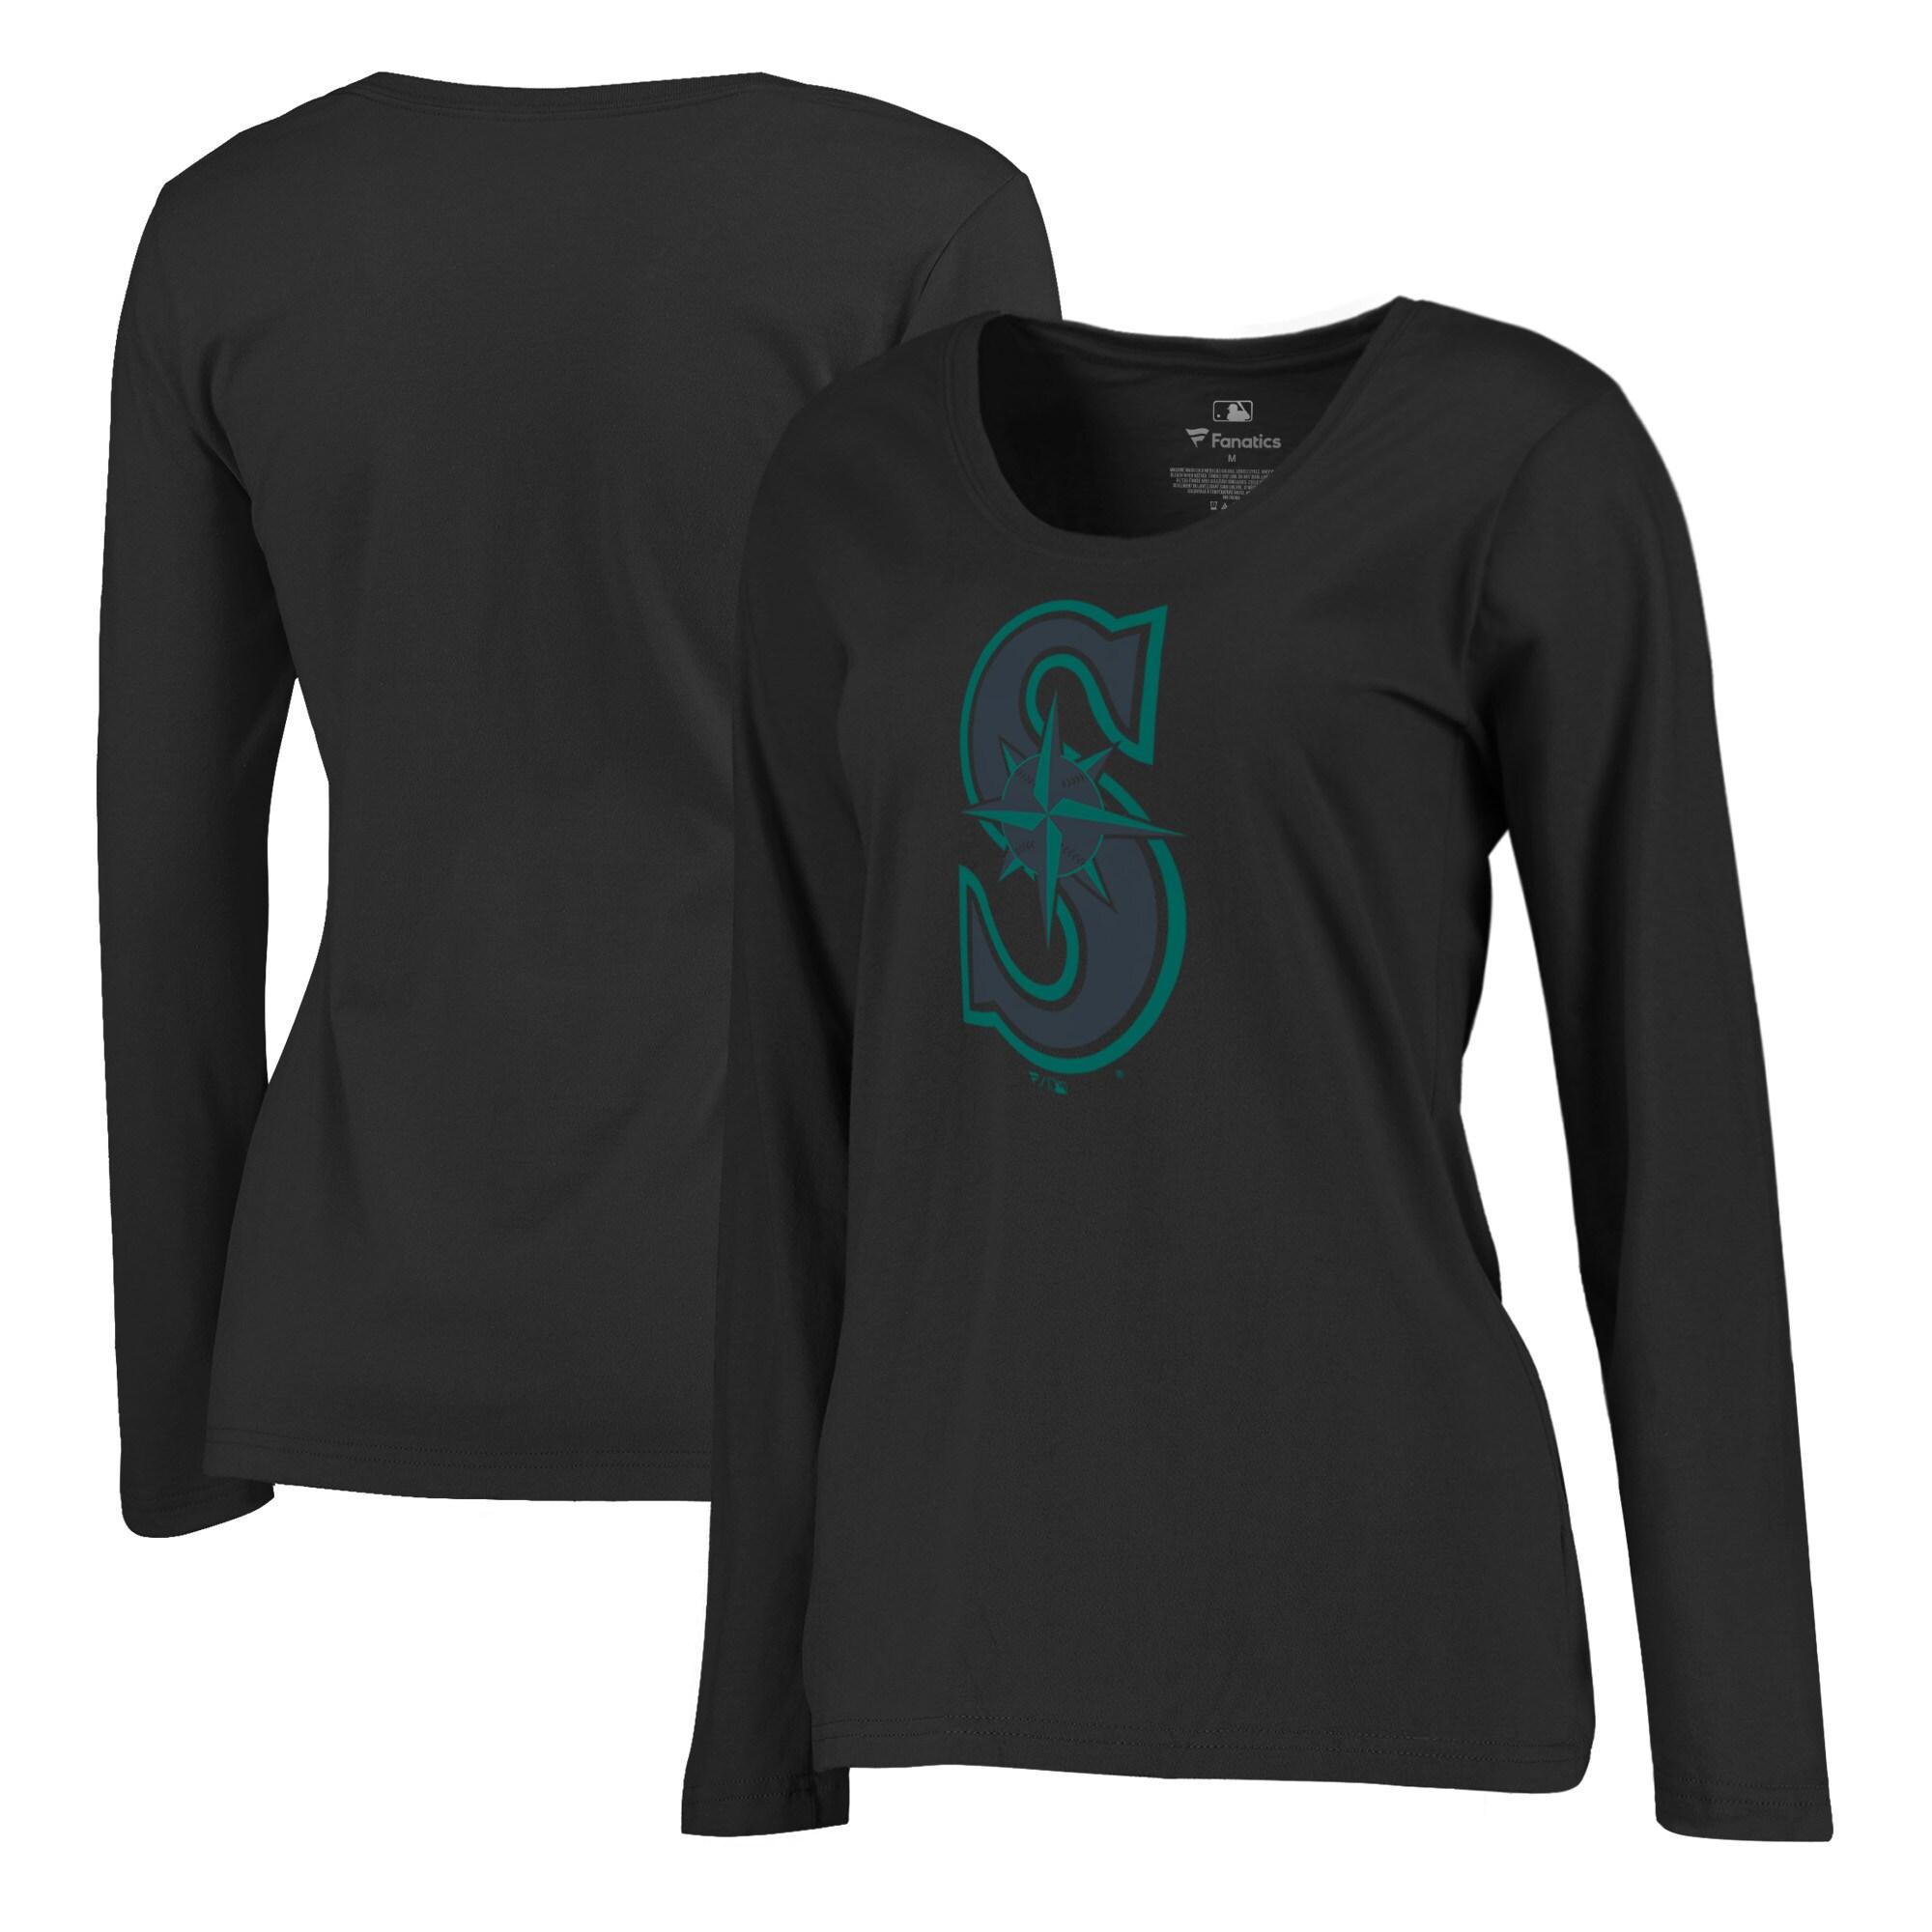 Seattle Mariners Fanatics Branded Women's Taylor Plus Size Long Sleeve T-Shirt - Black